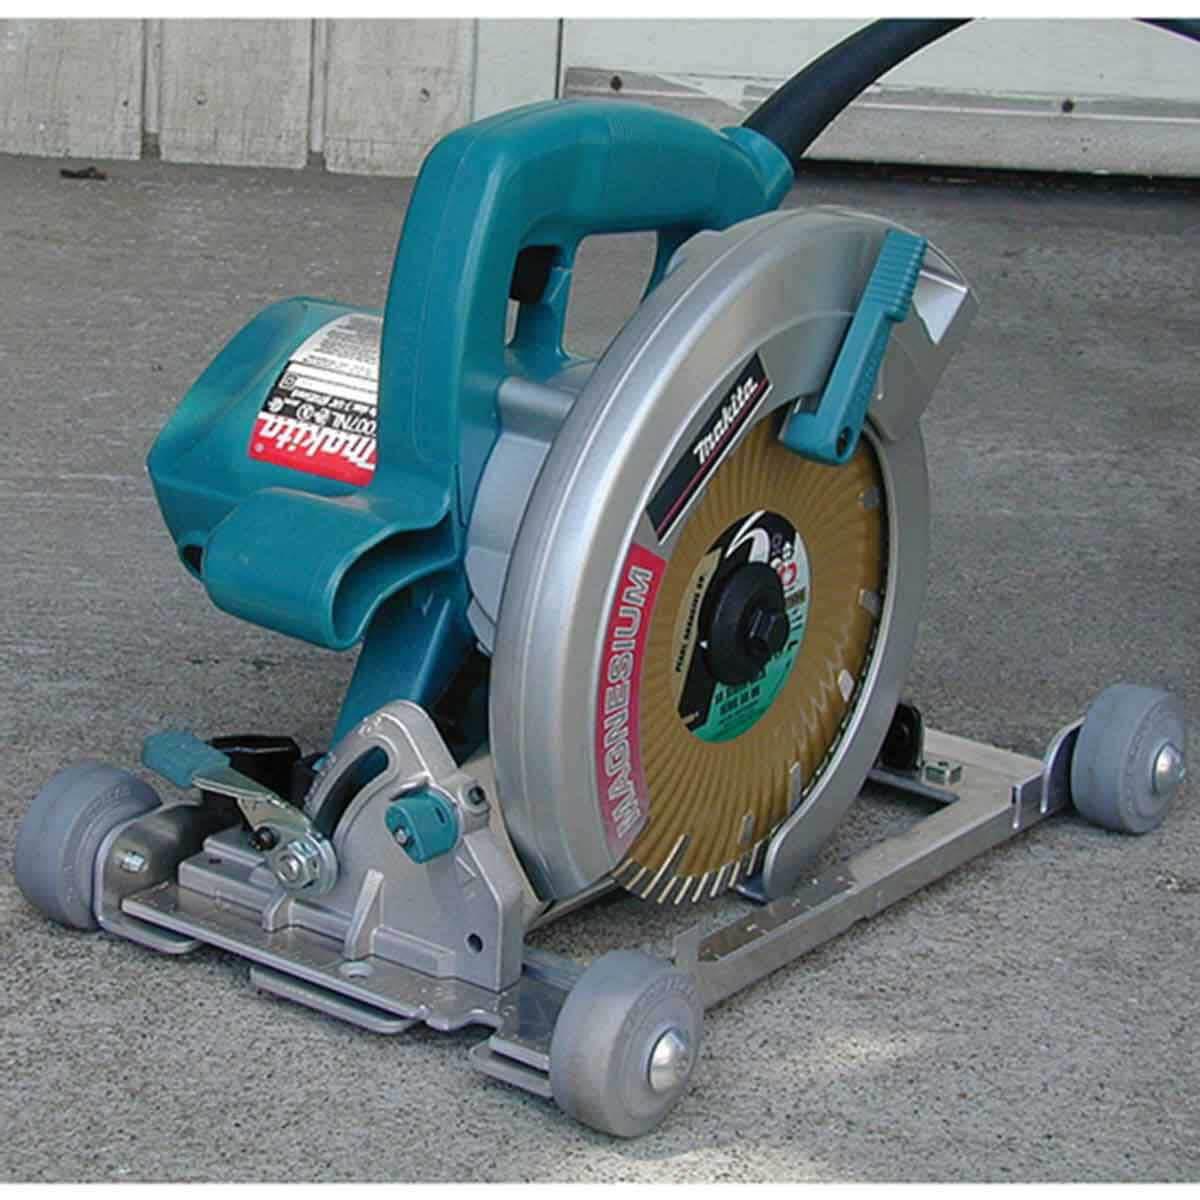 Pearl abrasive makita circular saw